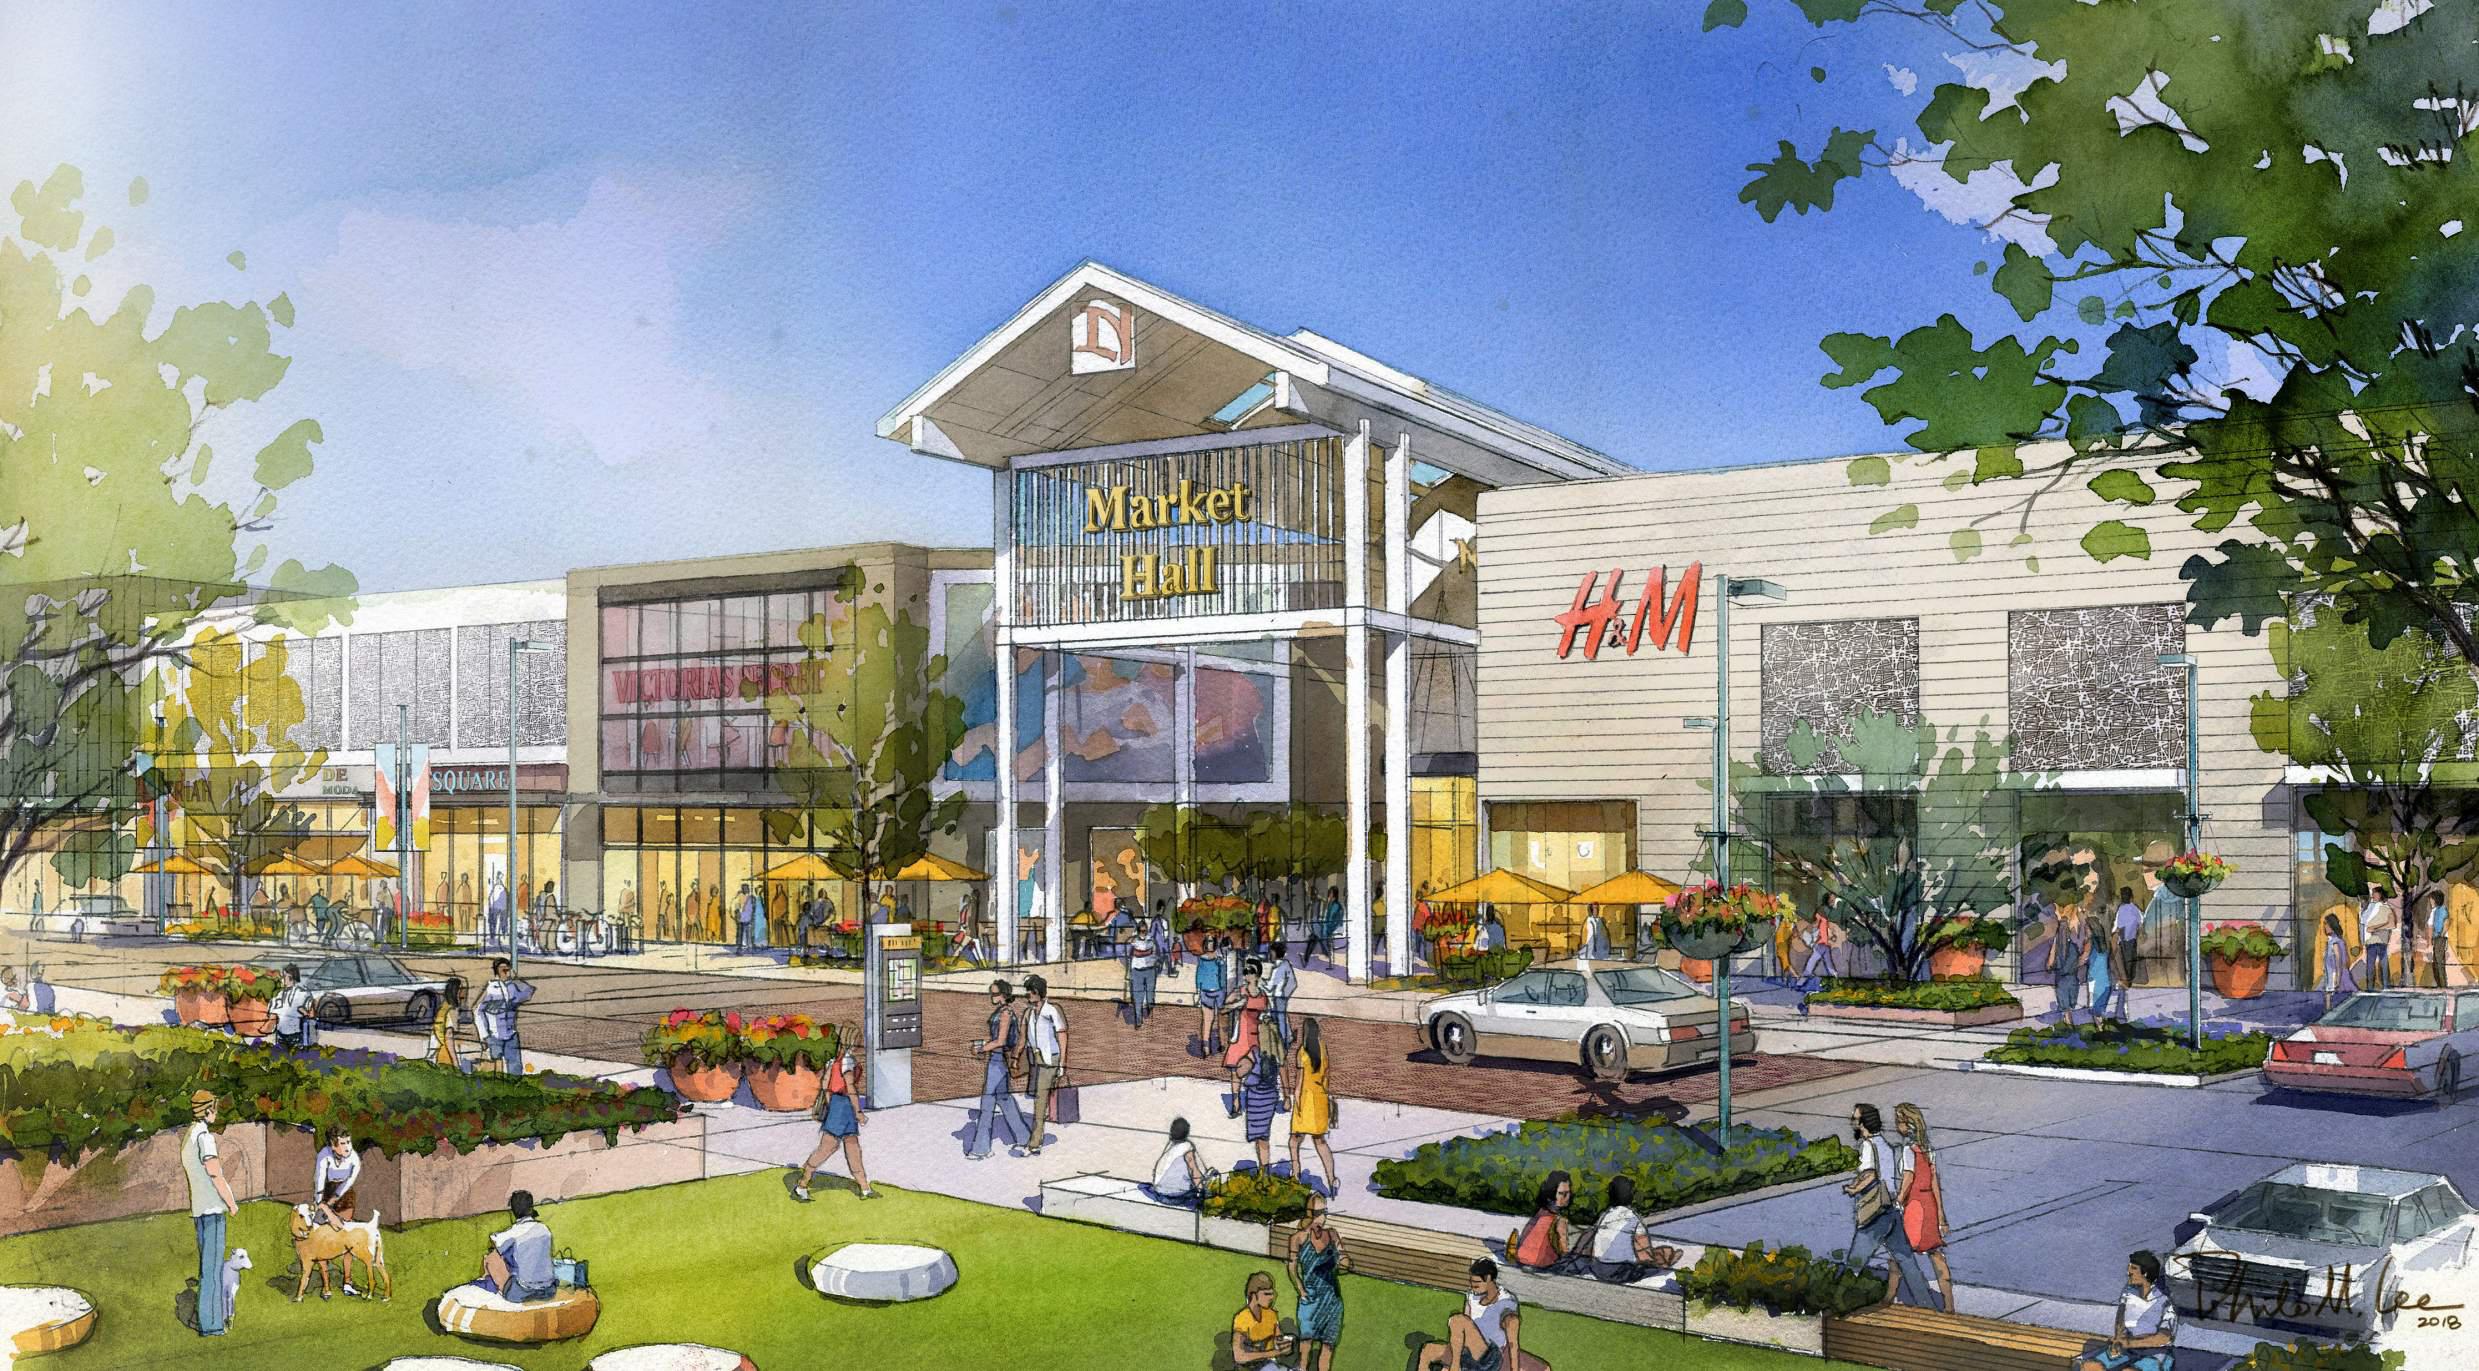 View of Main Street at Northgate Mall